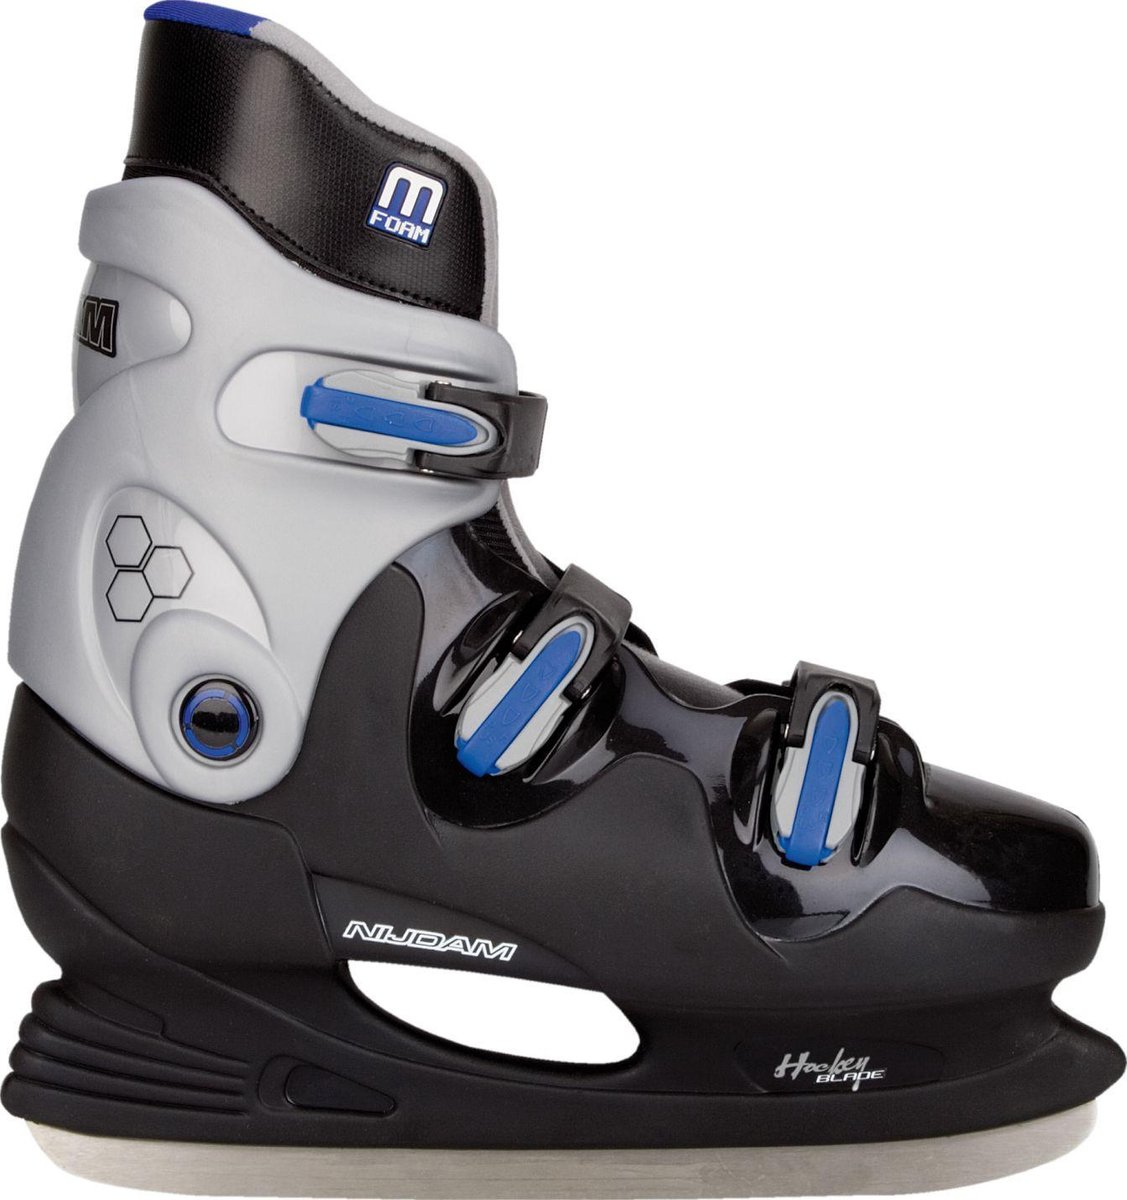 Nijdam IJshockeyschaats - Hardboot - Zwart/Blauw - Maat 43